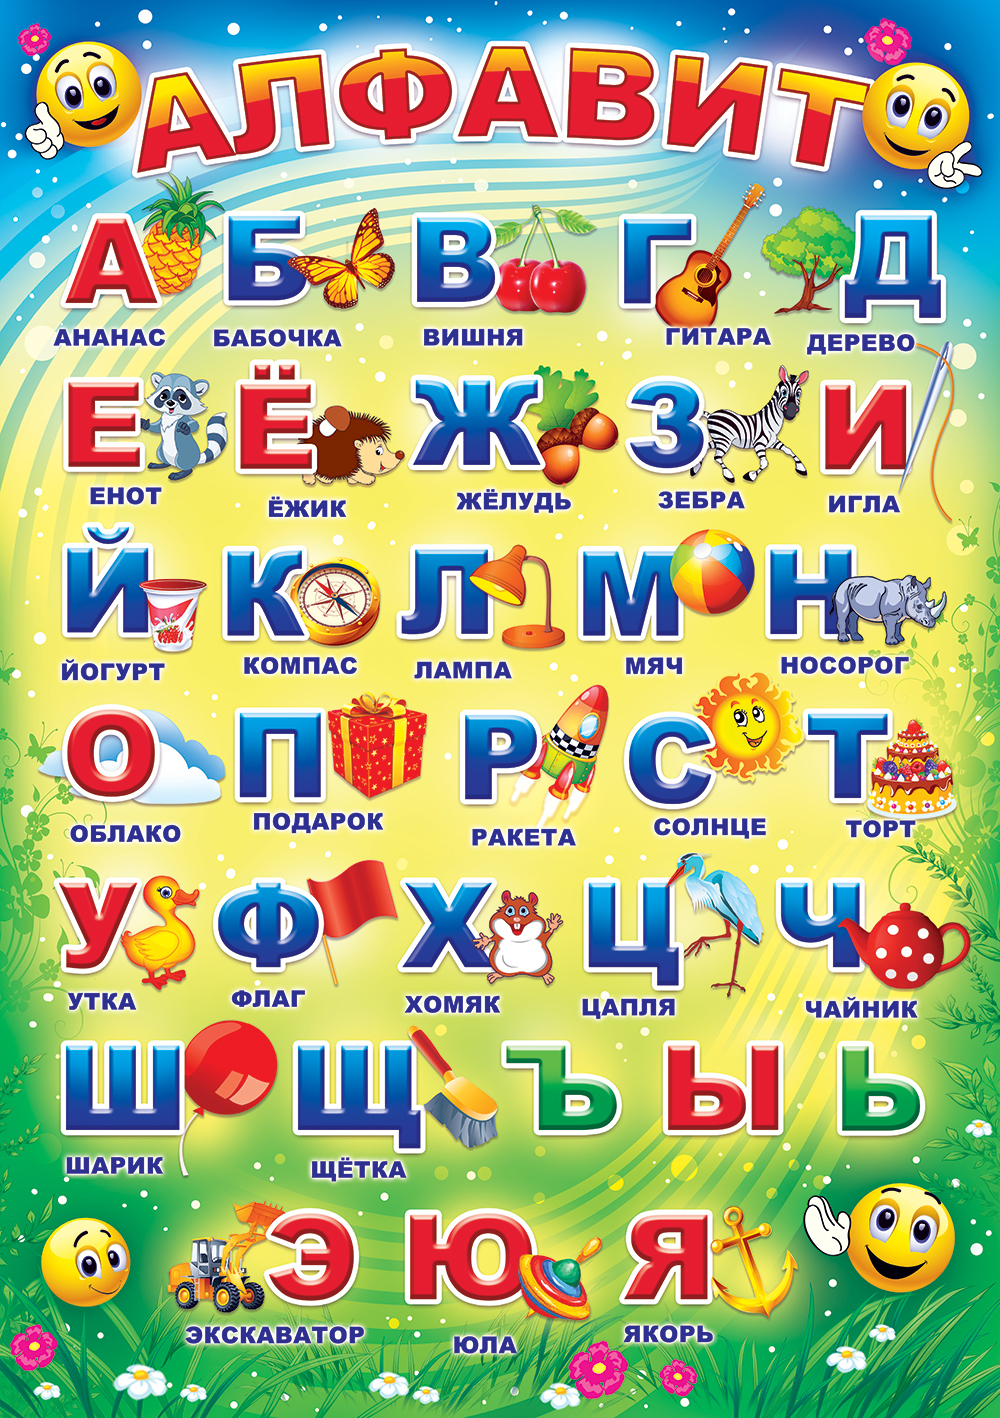 Алфавит Русского Языка Плакат